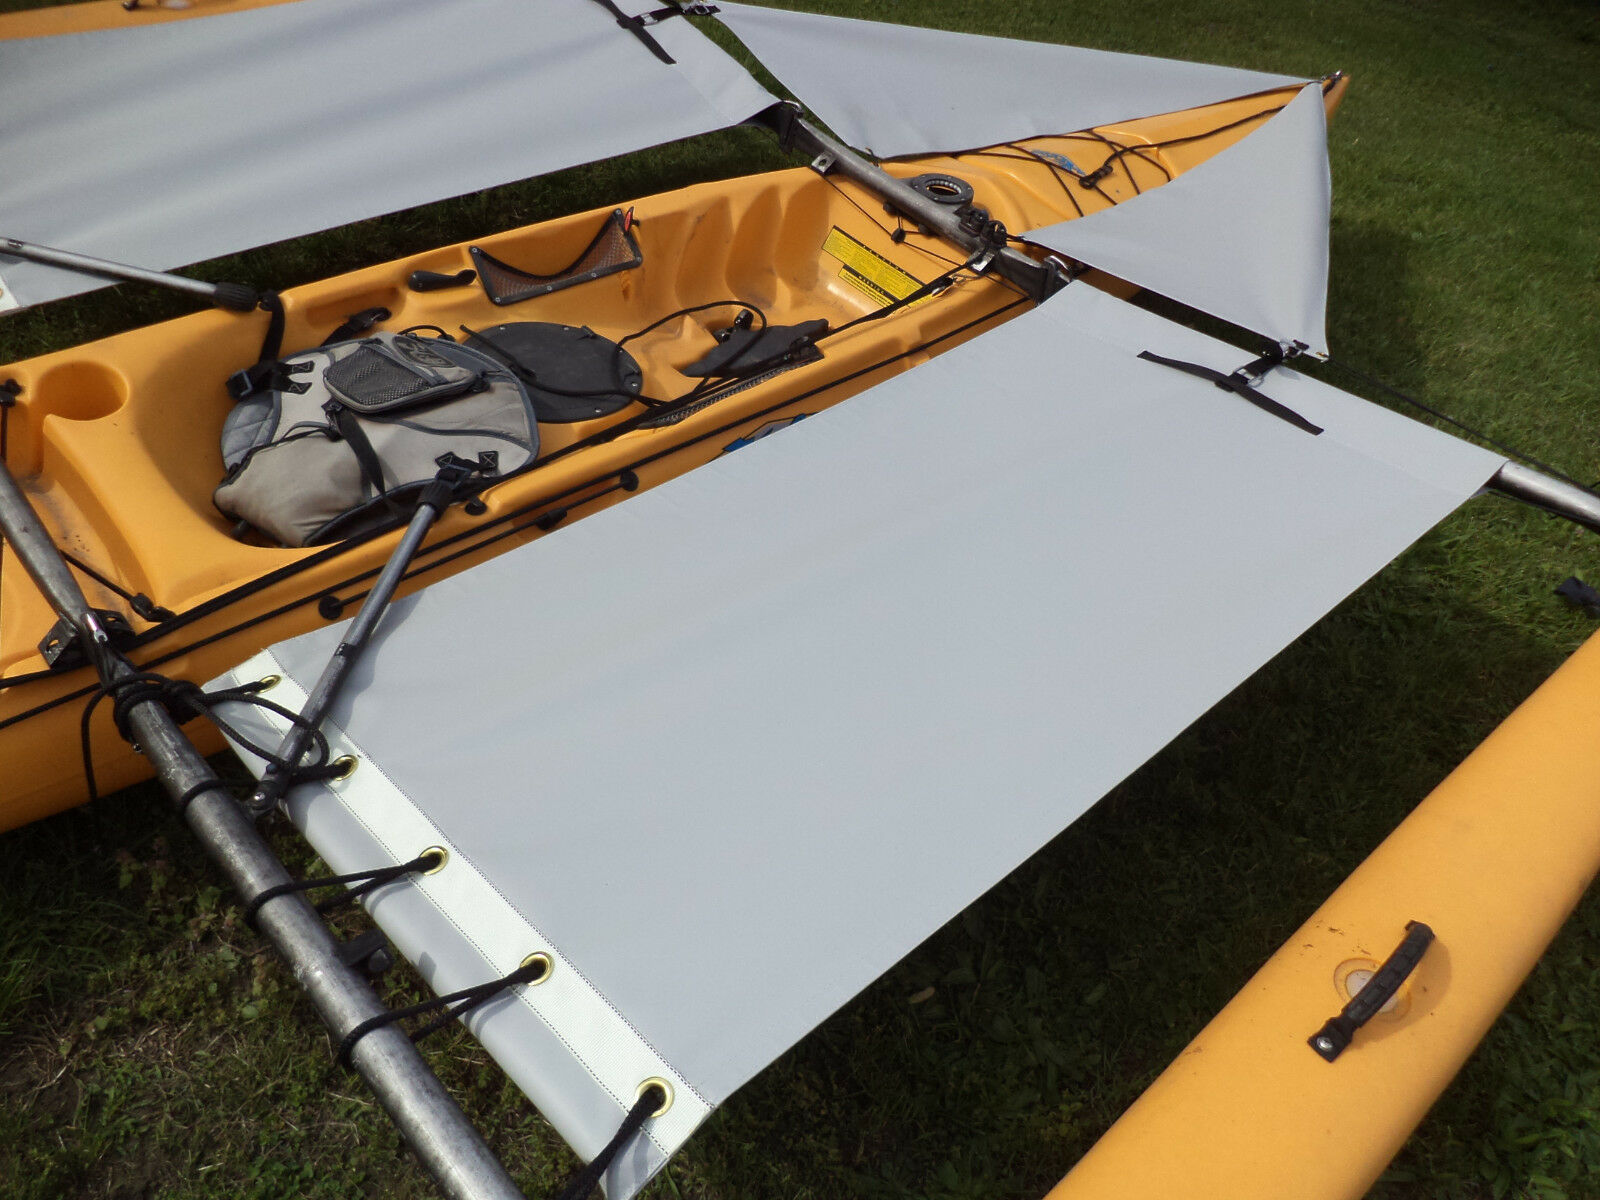 grau  Trampoline & splash  shield set - for 2014 down Adventure  Island Kayak